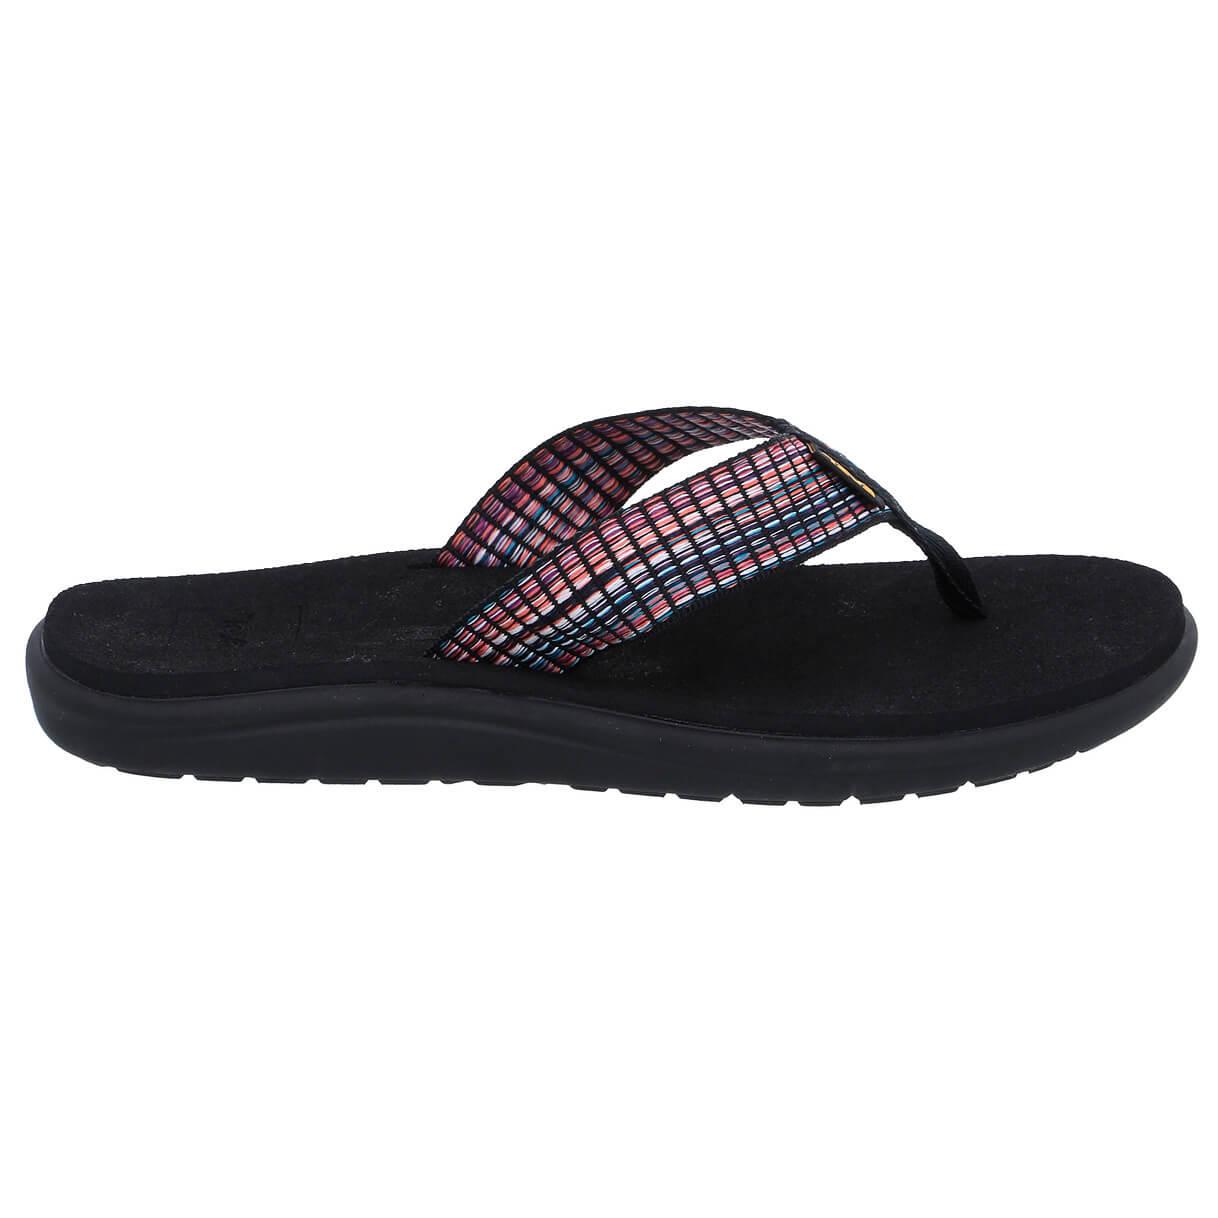 17c8281d8 Teva - Women s Voya Flip - Sandals